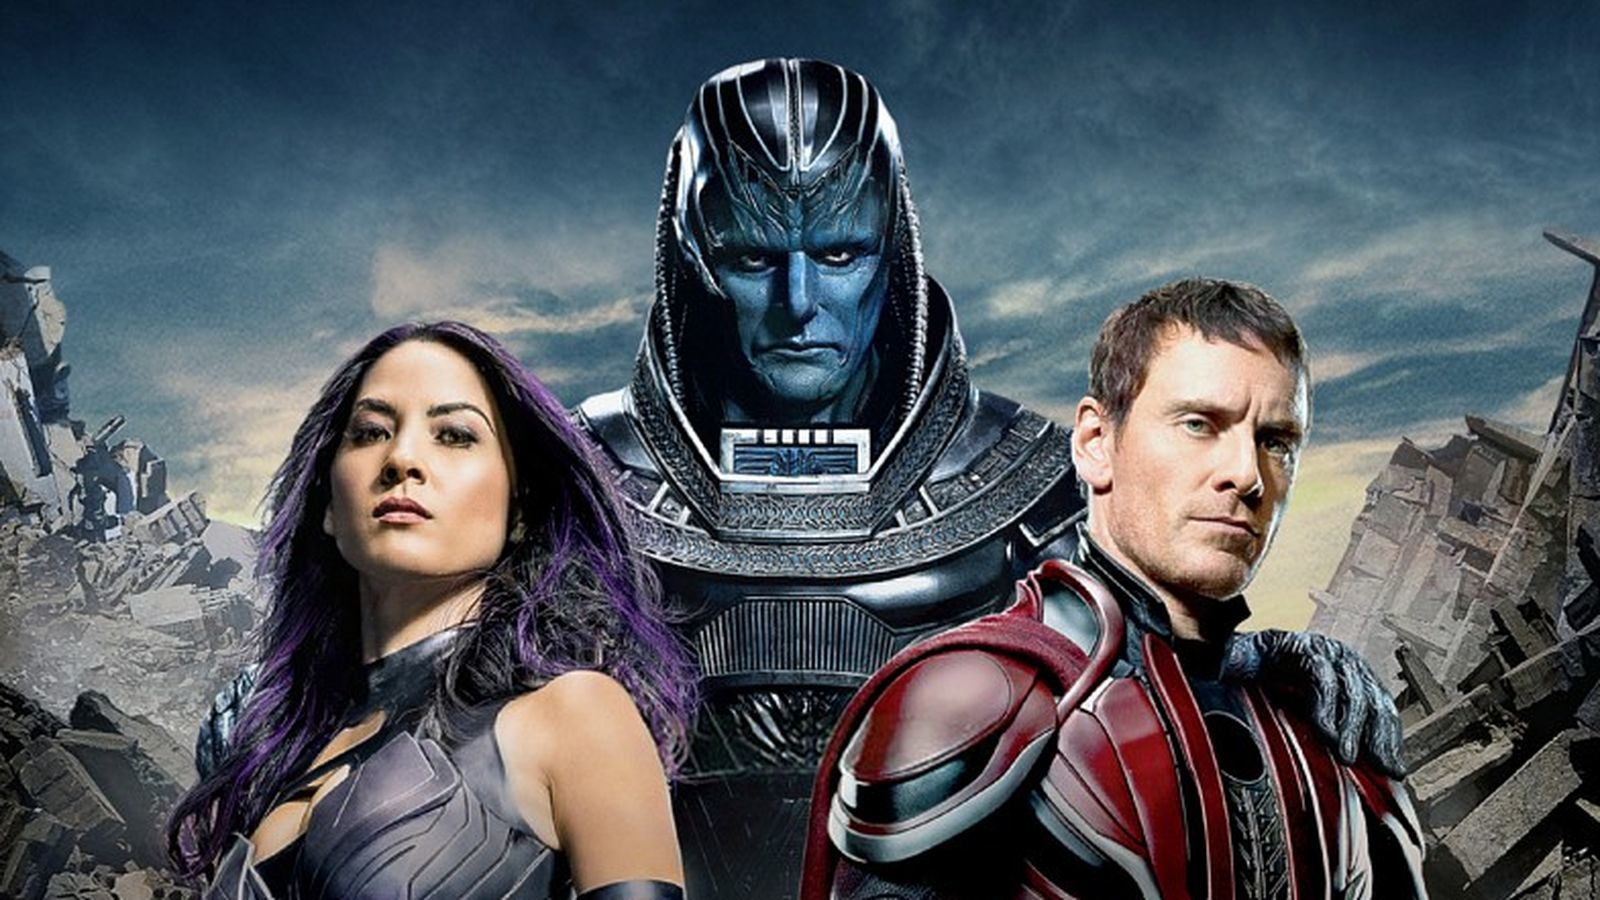 X-Men: Apocalypse (May 27)